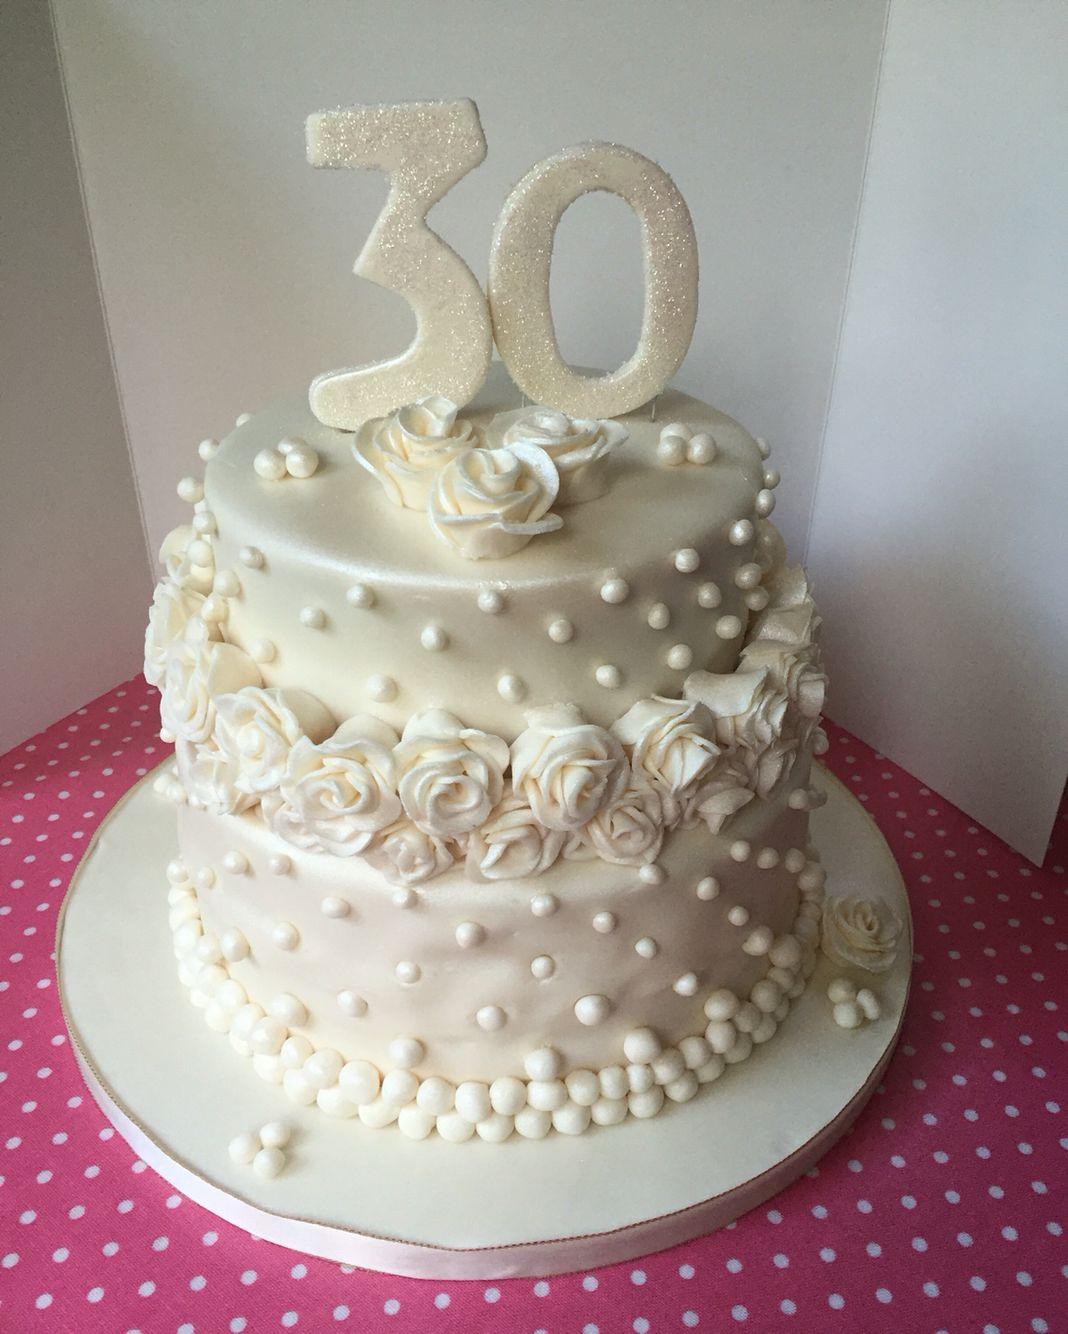 30Th Wedding Anniversary Cakes  30th wedding anniversary cake pearl anniversary so